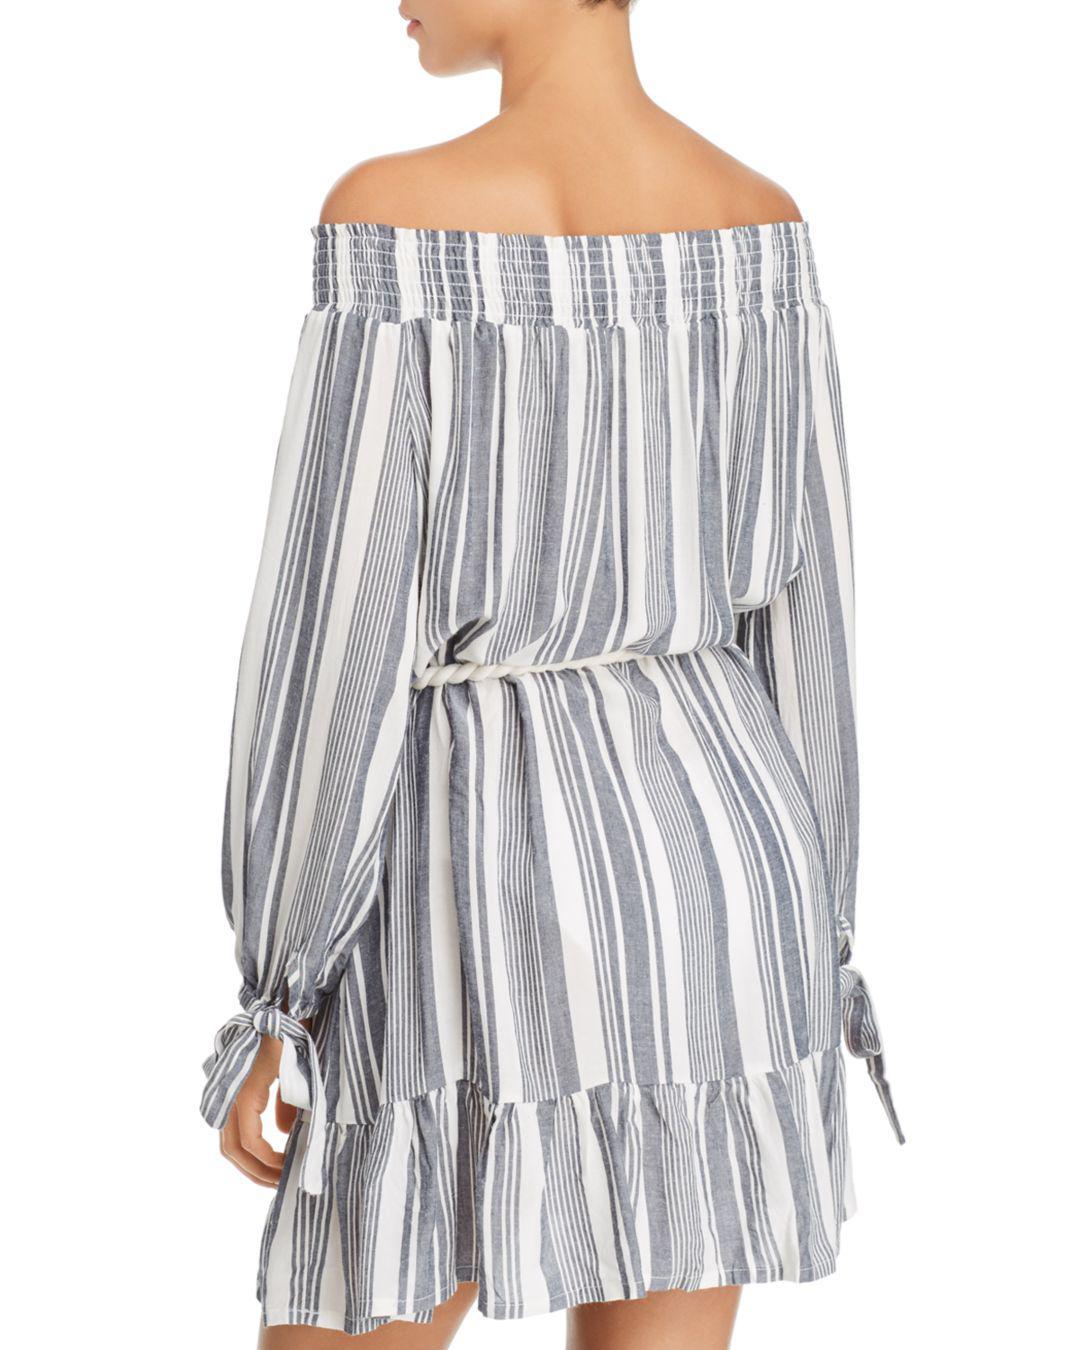 b4cadeb503 Lyst - Surf Gypsy Off-the-shoulder Stripe Dress Swim Cover-up in Blue